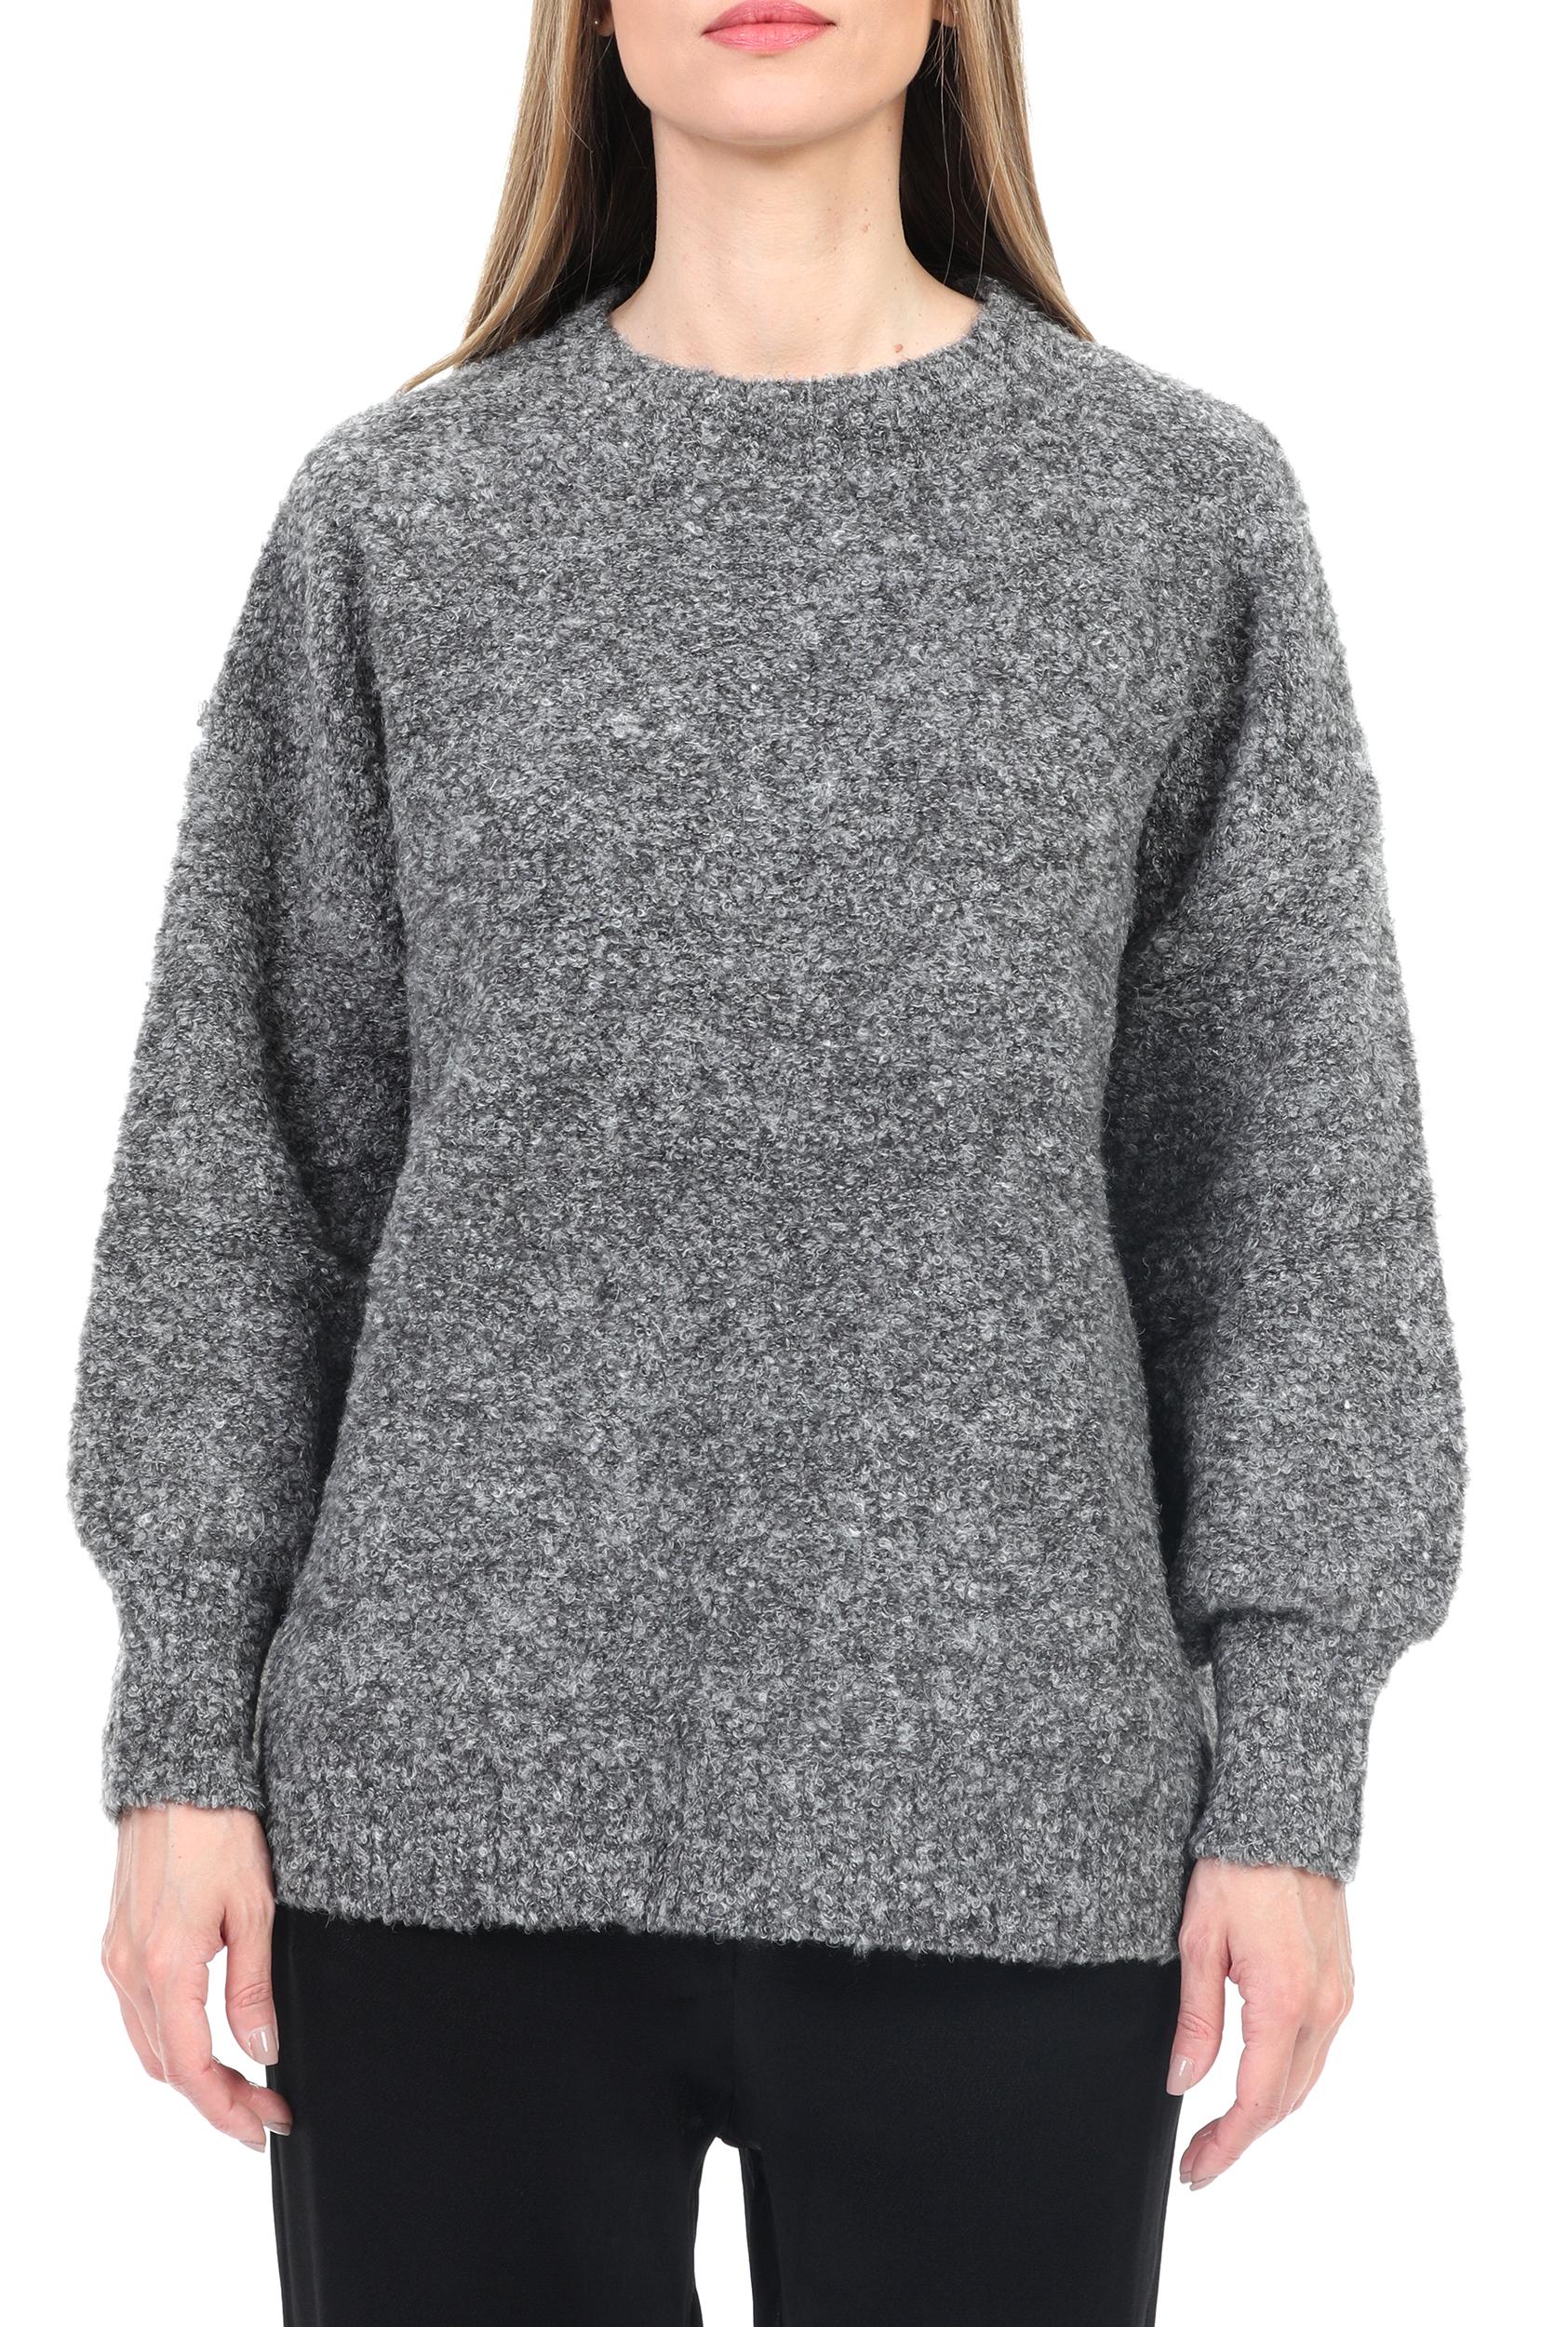 MOLLY BRACKEN - Γυναικείο πουλόβερ MOLLY BRACKEN γκρι